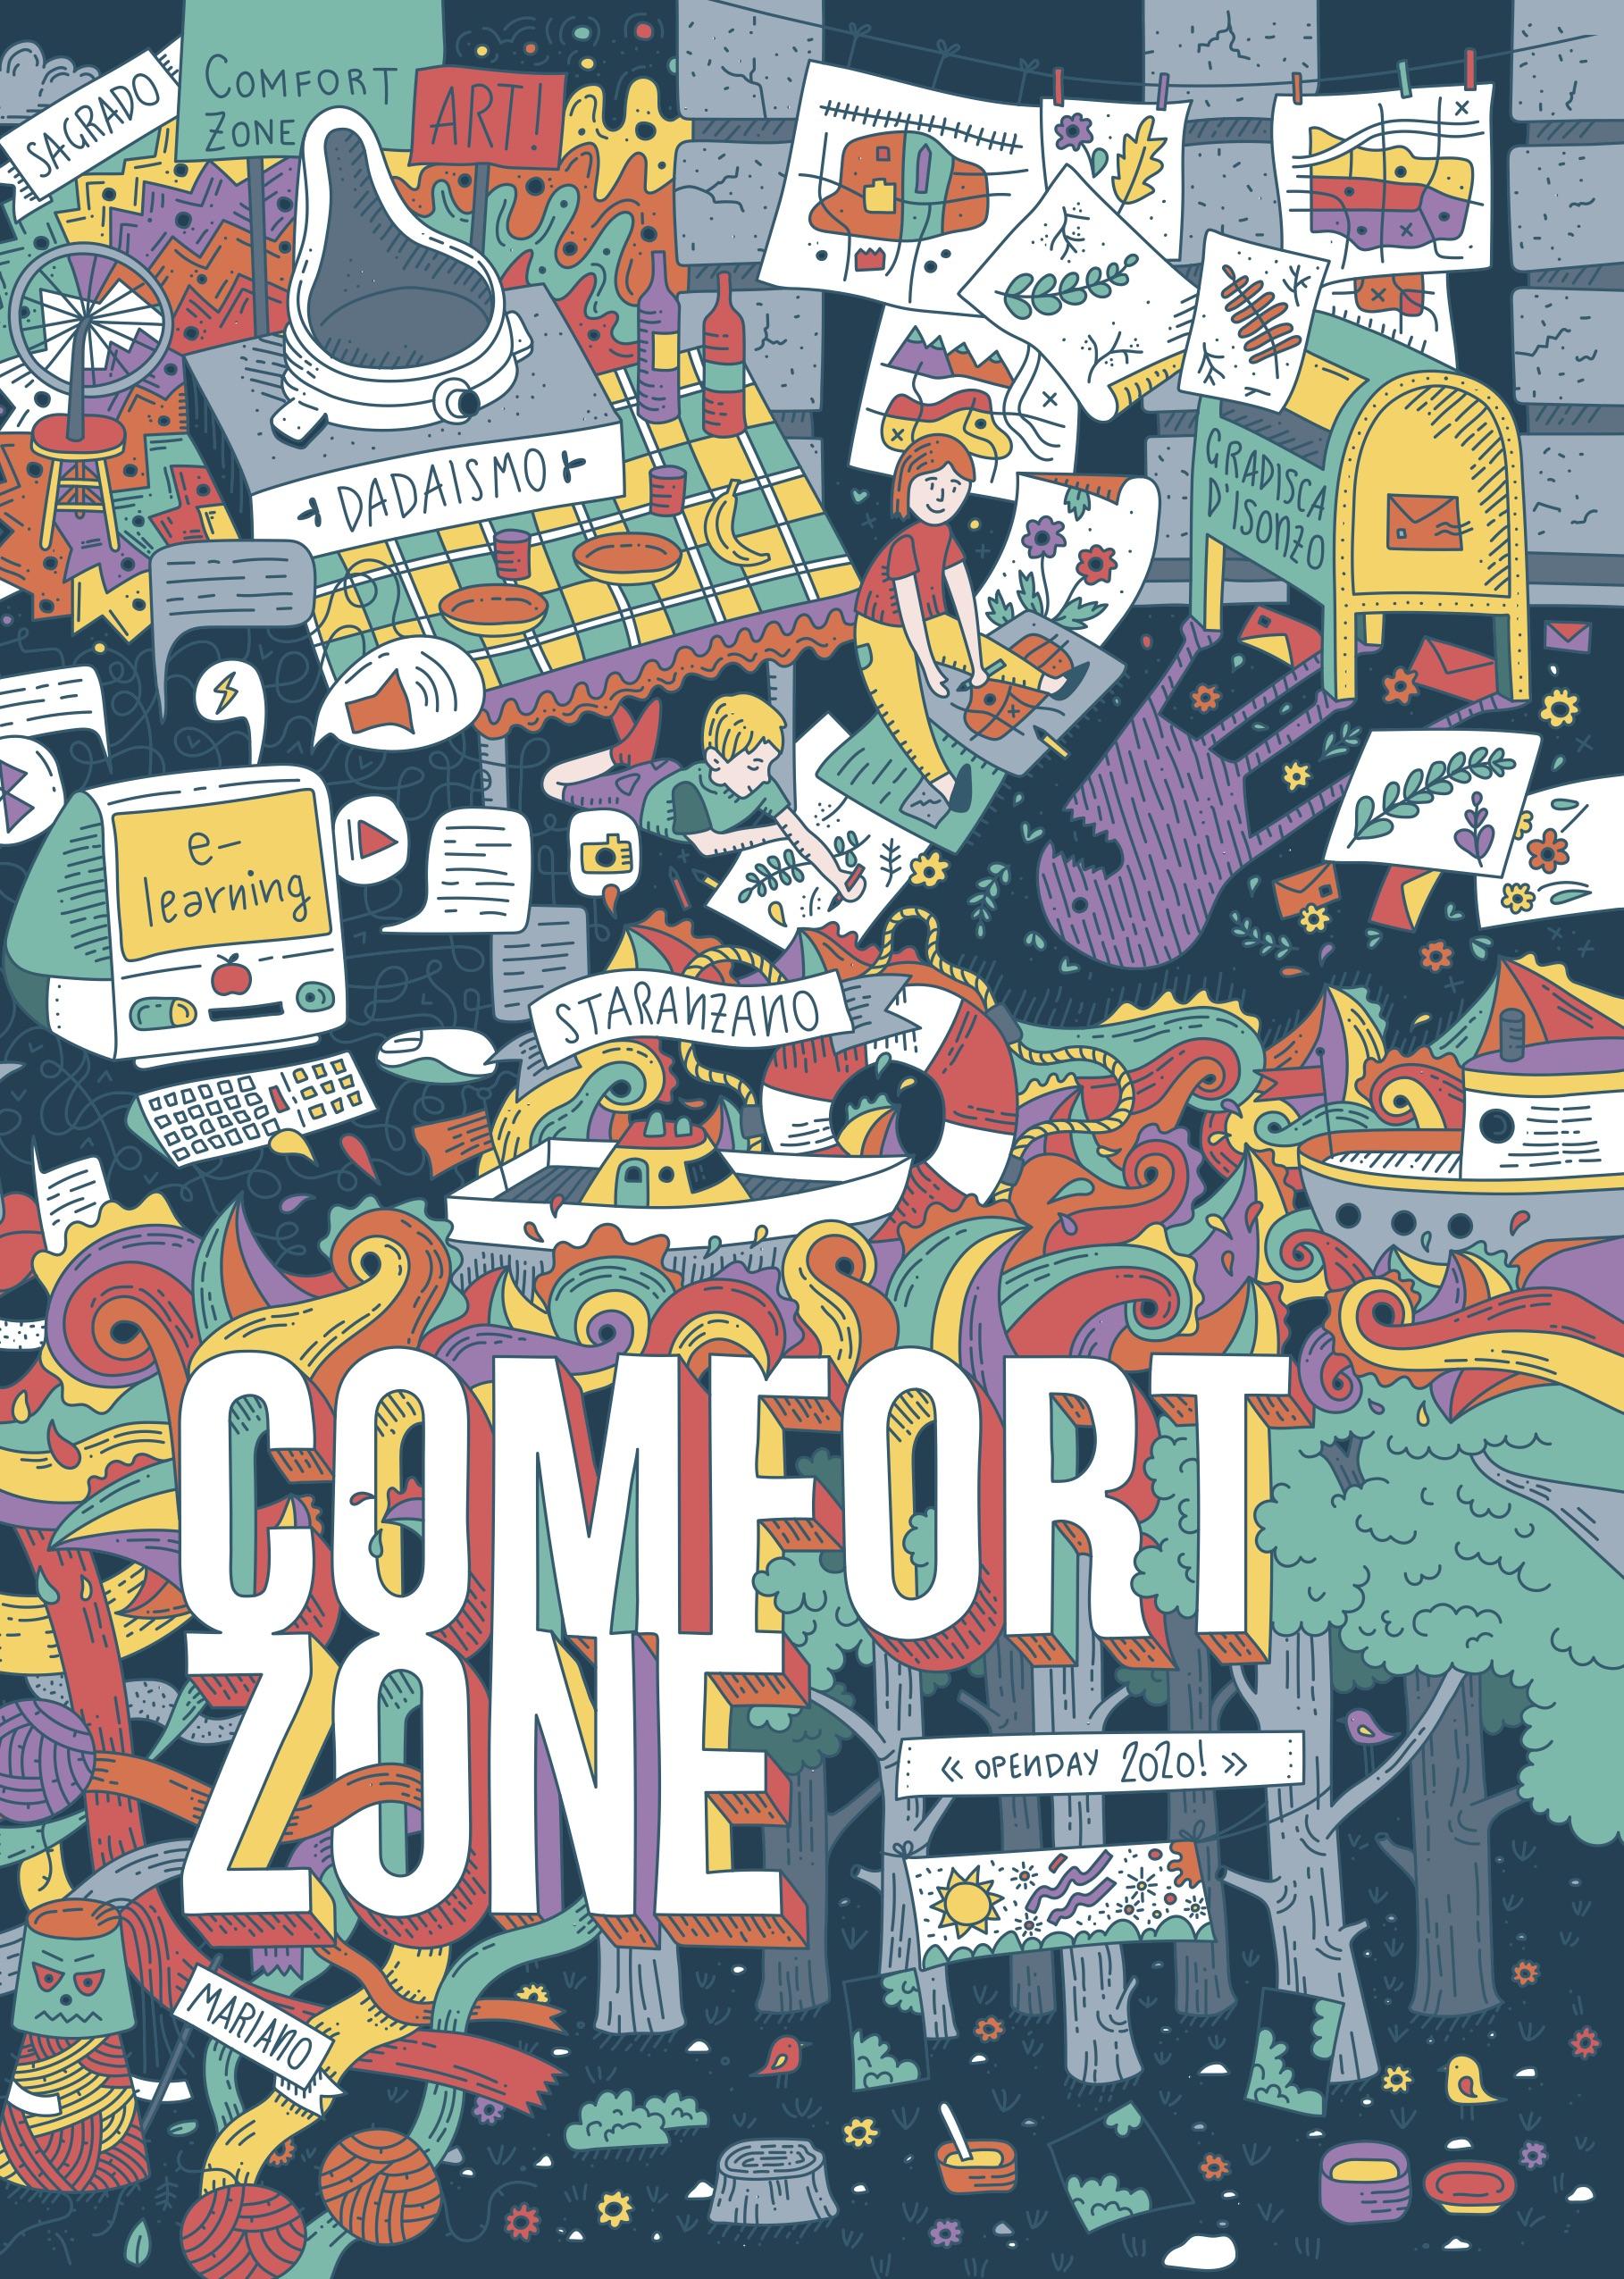 Comfort Zone Atelier 2020